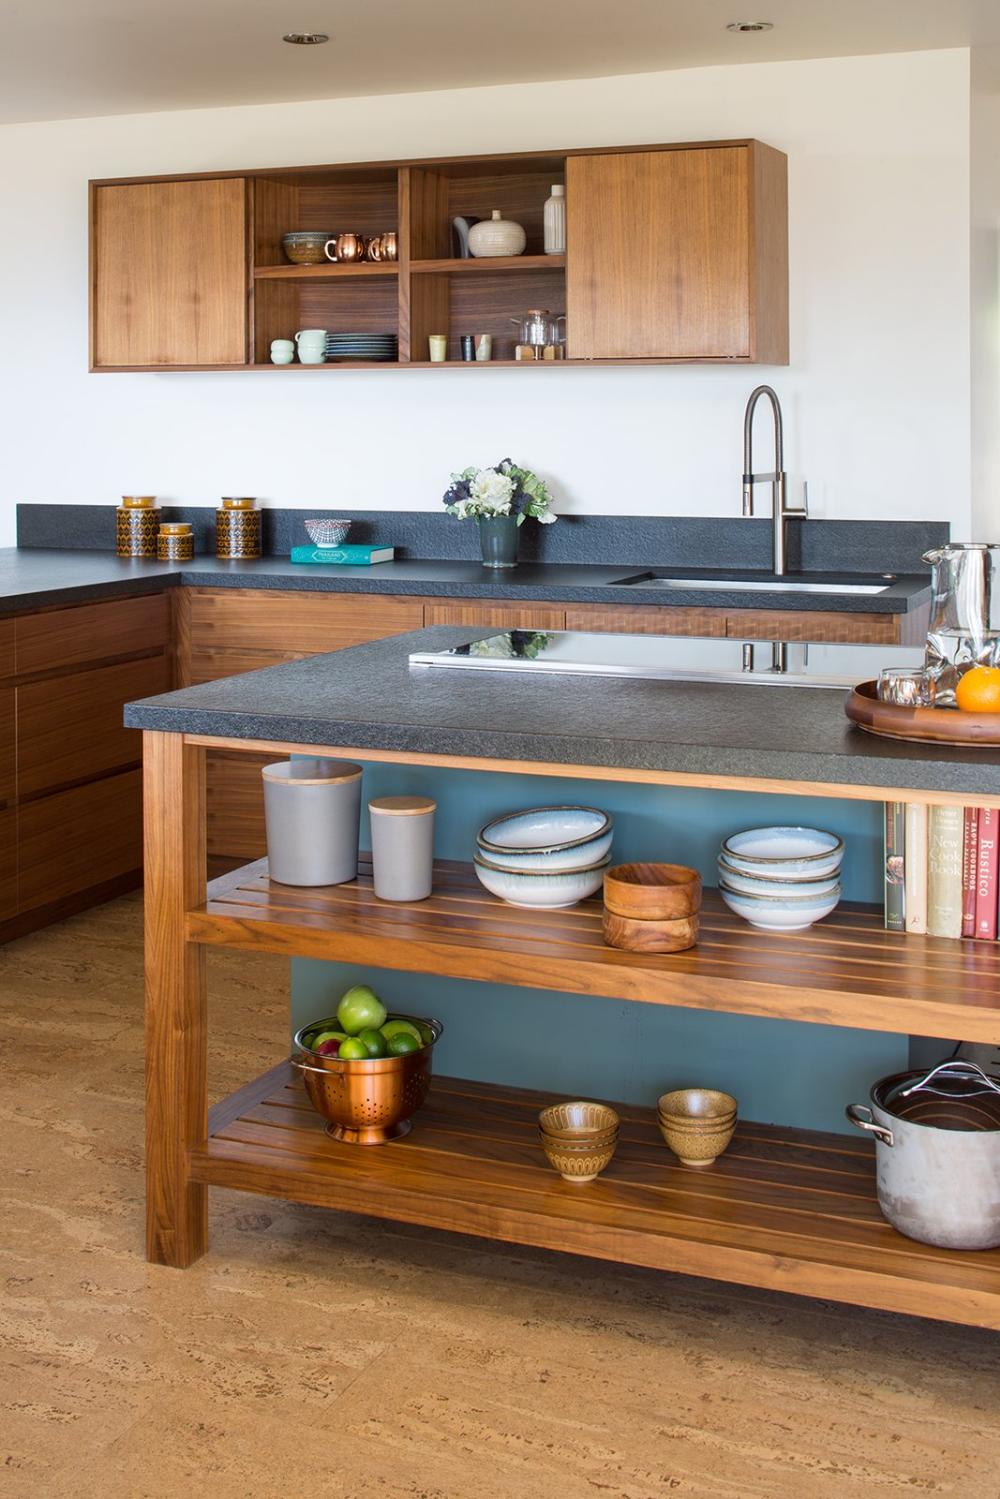 Glendale Mid Century Modern Home In Glendale California On Dwell Modern Kitchen Open Shelving Mid Century Modern Kitchen Modern Kitchen